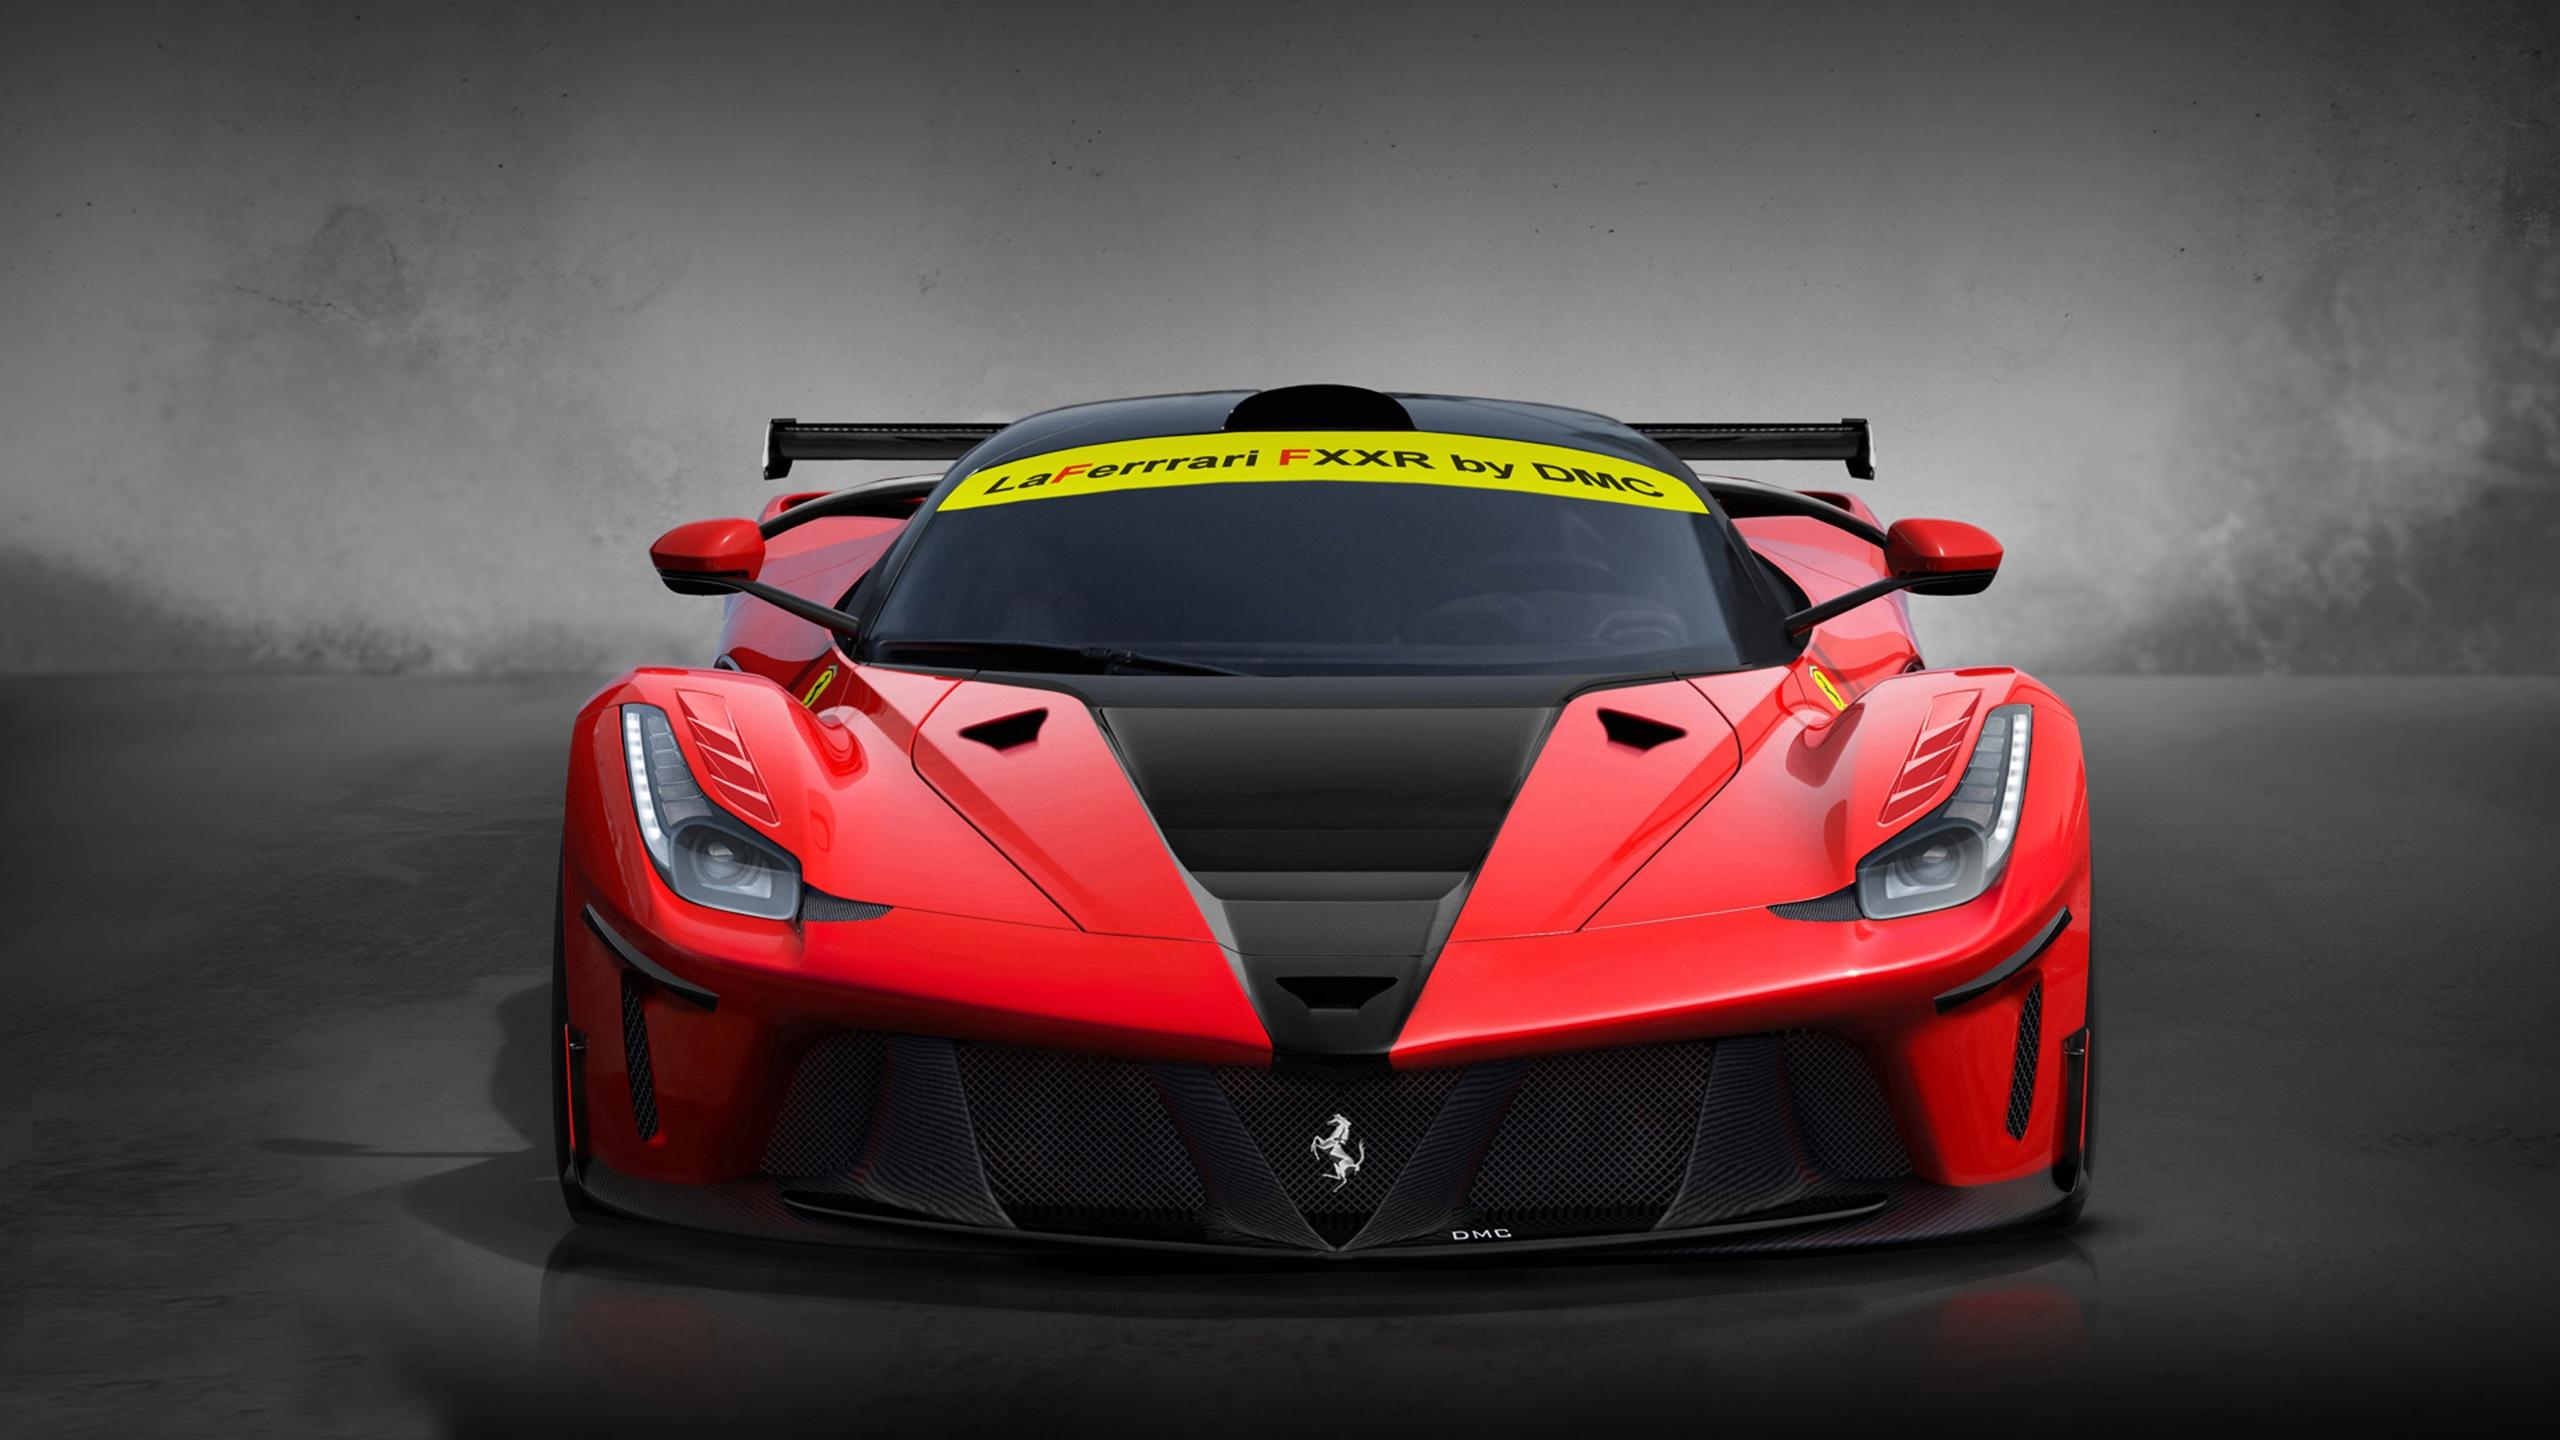 Wallpaper Dmc Laferrari Fxxr Red Supercar 2560x1440 Qhd